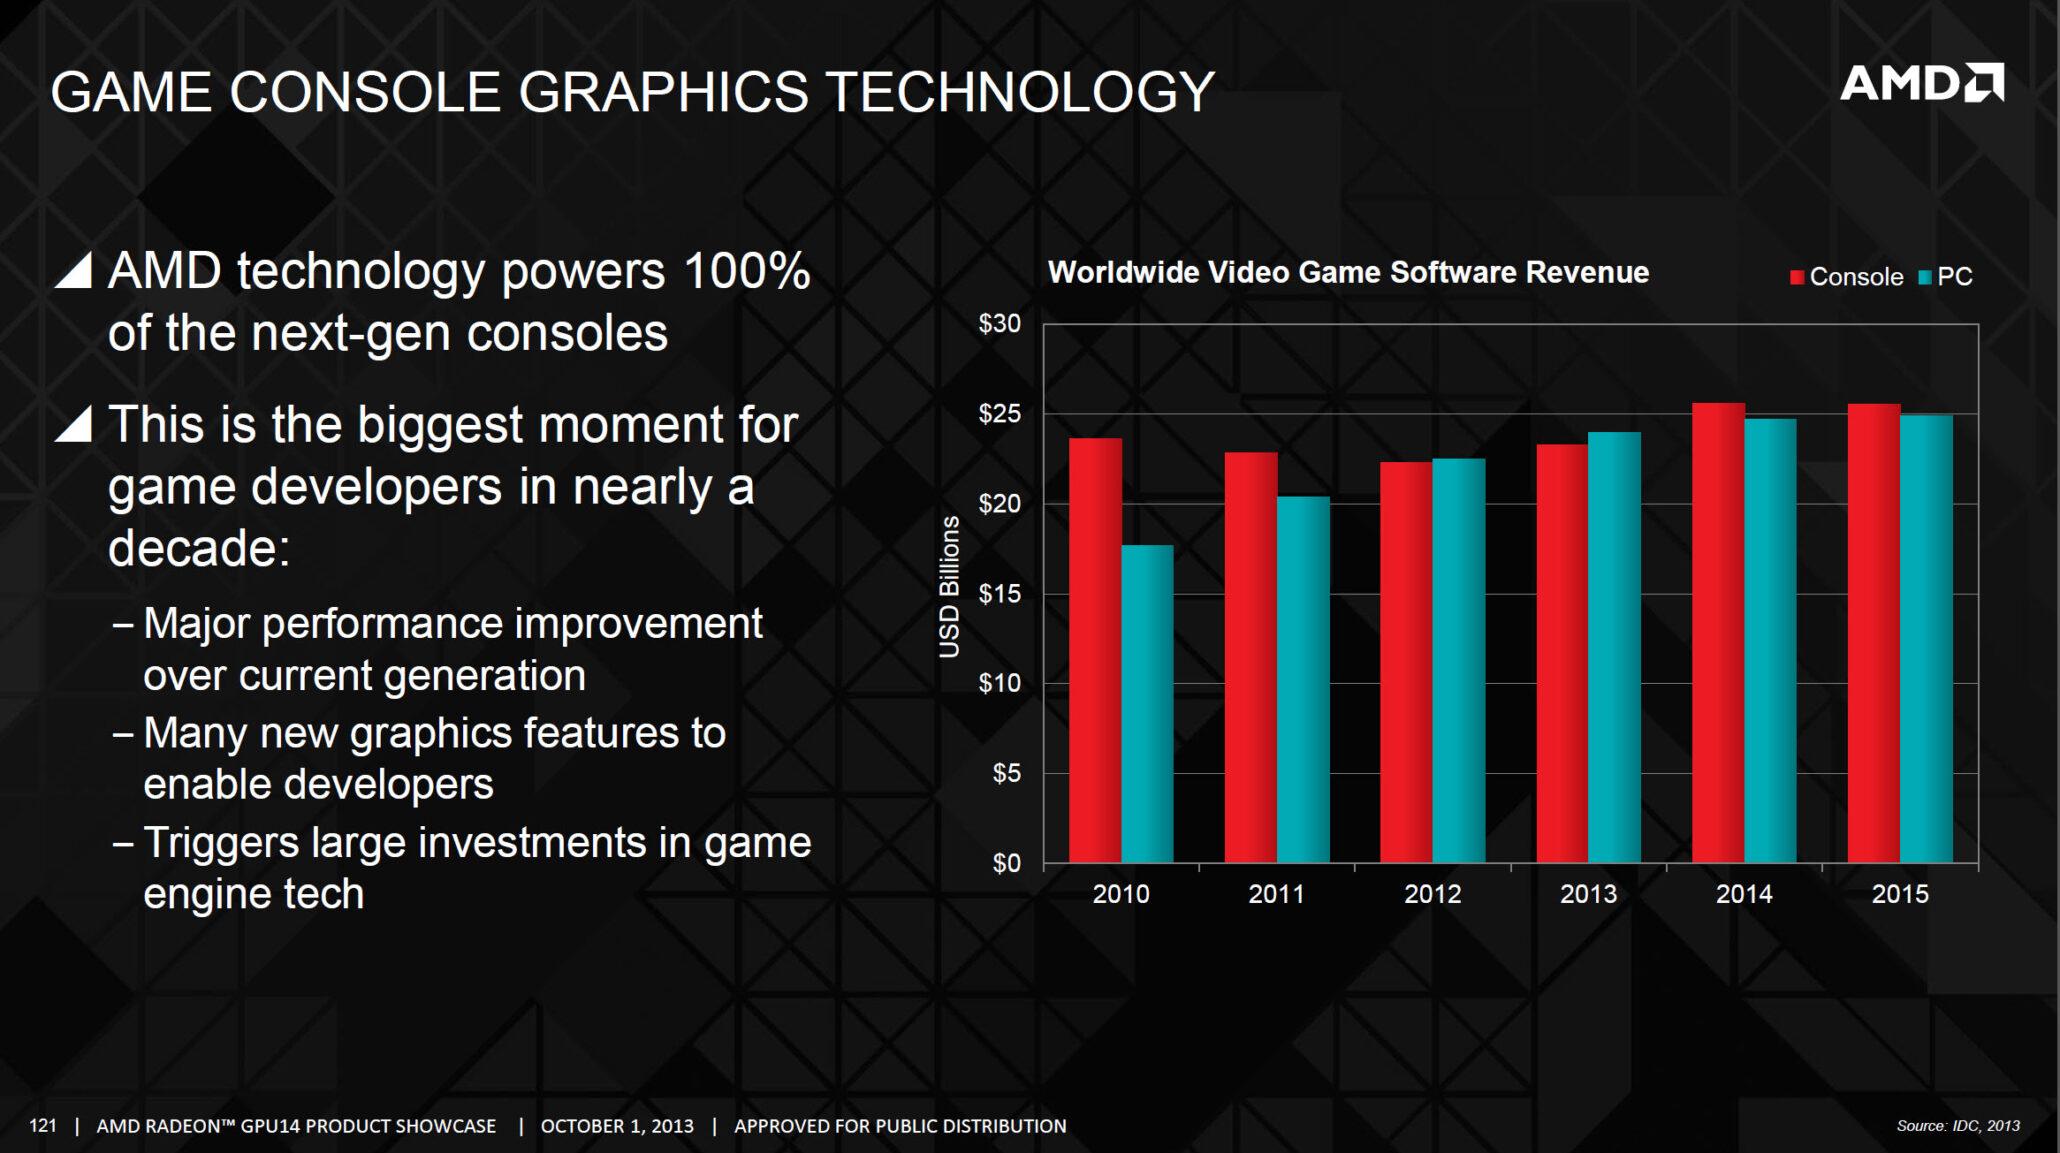 amd-console-graphics-technology